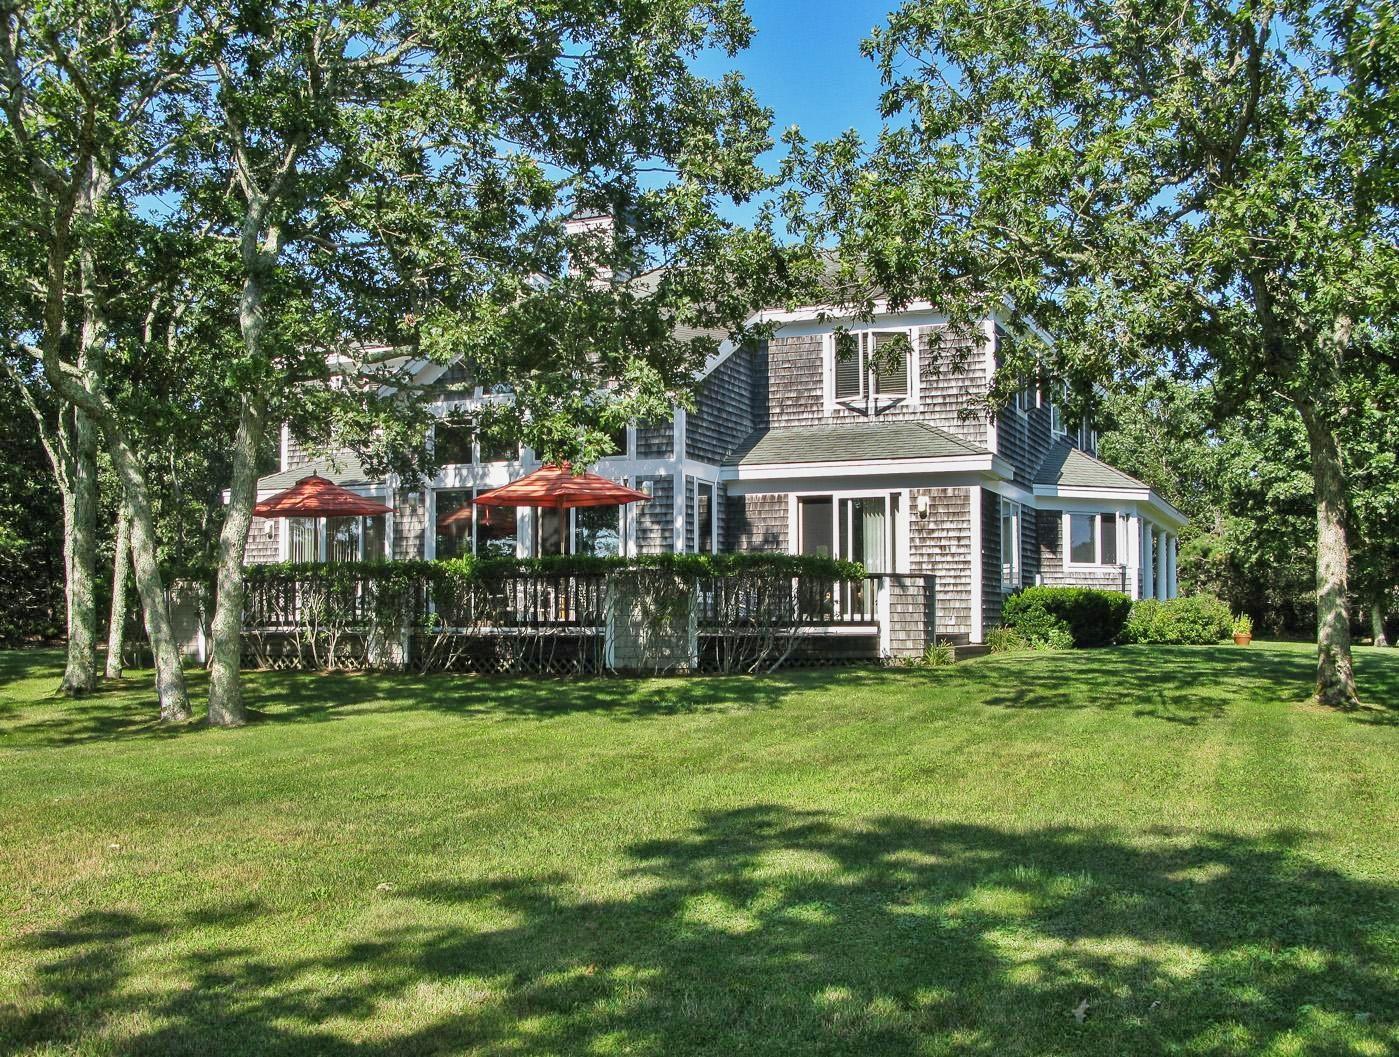 West Tisbury Vacation Rental Home In Martha's Vineyard